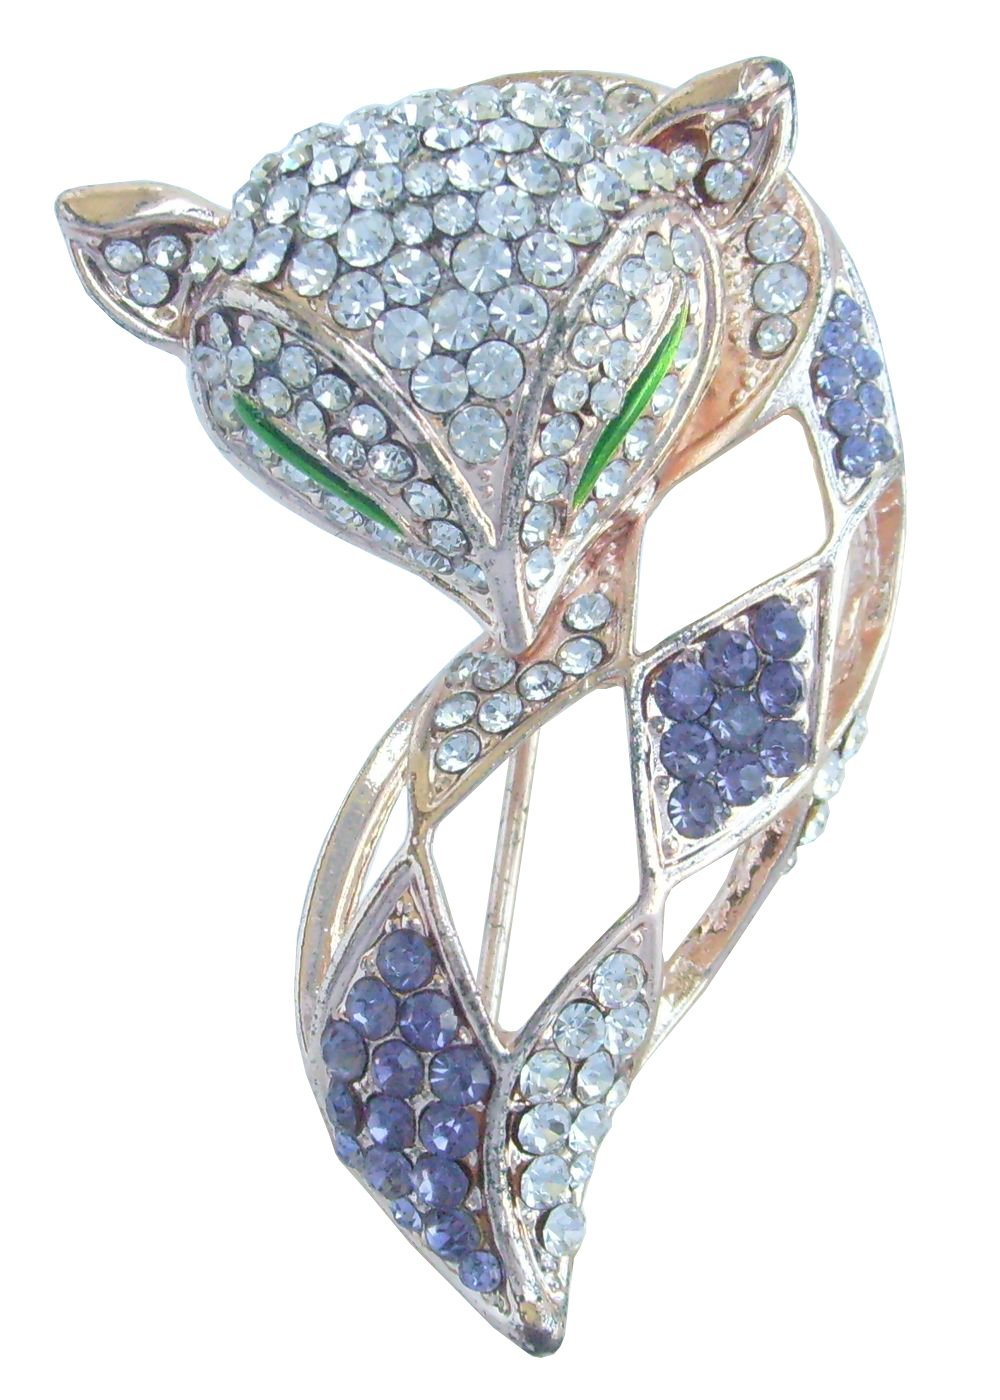 Sindary Art Style 1.97'' Lovely Animal Fox Brooch Pin Austrian Crystal BZ6347